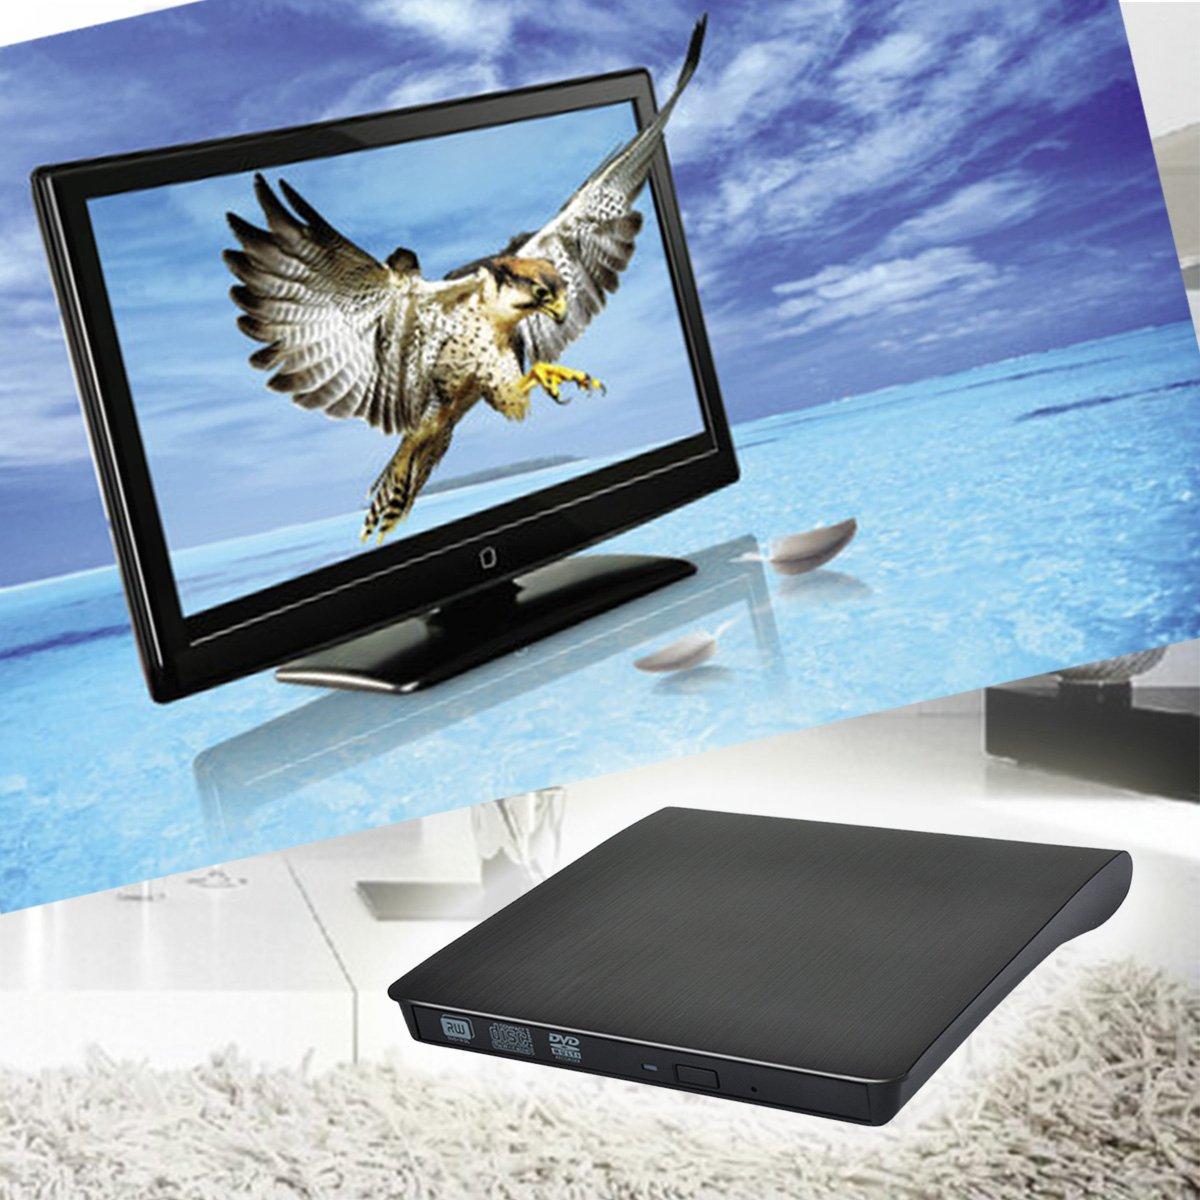 Amazon.com: UEB USB 3.0 Ultra Slim External CD DVD RW DVD ROM Drive/Writer/Burner for XP Windows 7,Windows 8,Windows 10 - Black: Computers & Accessories